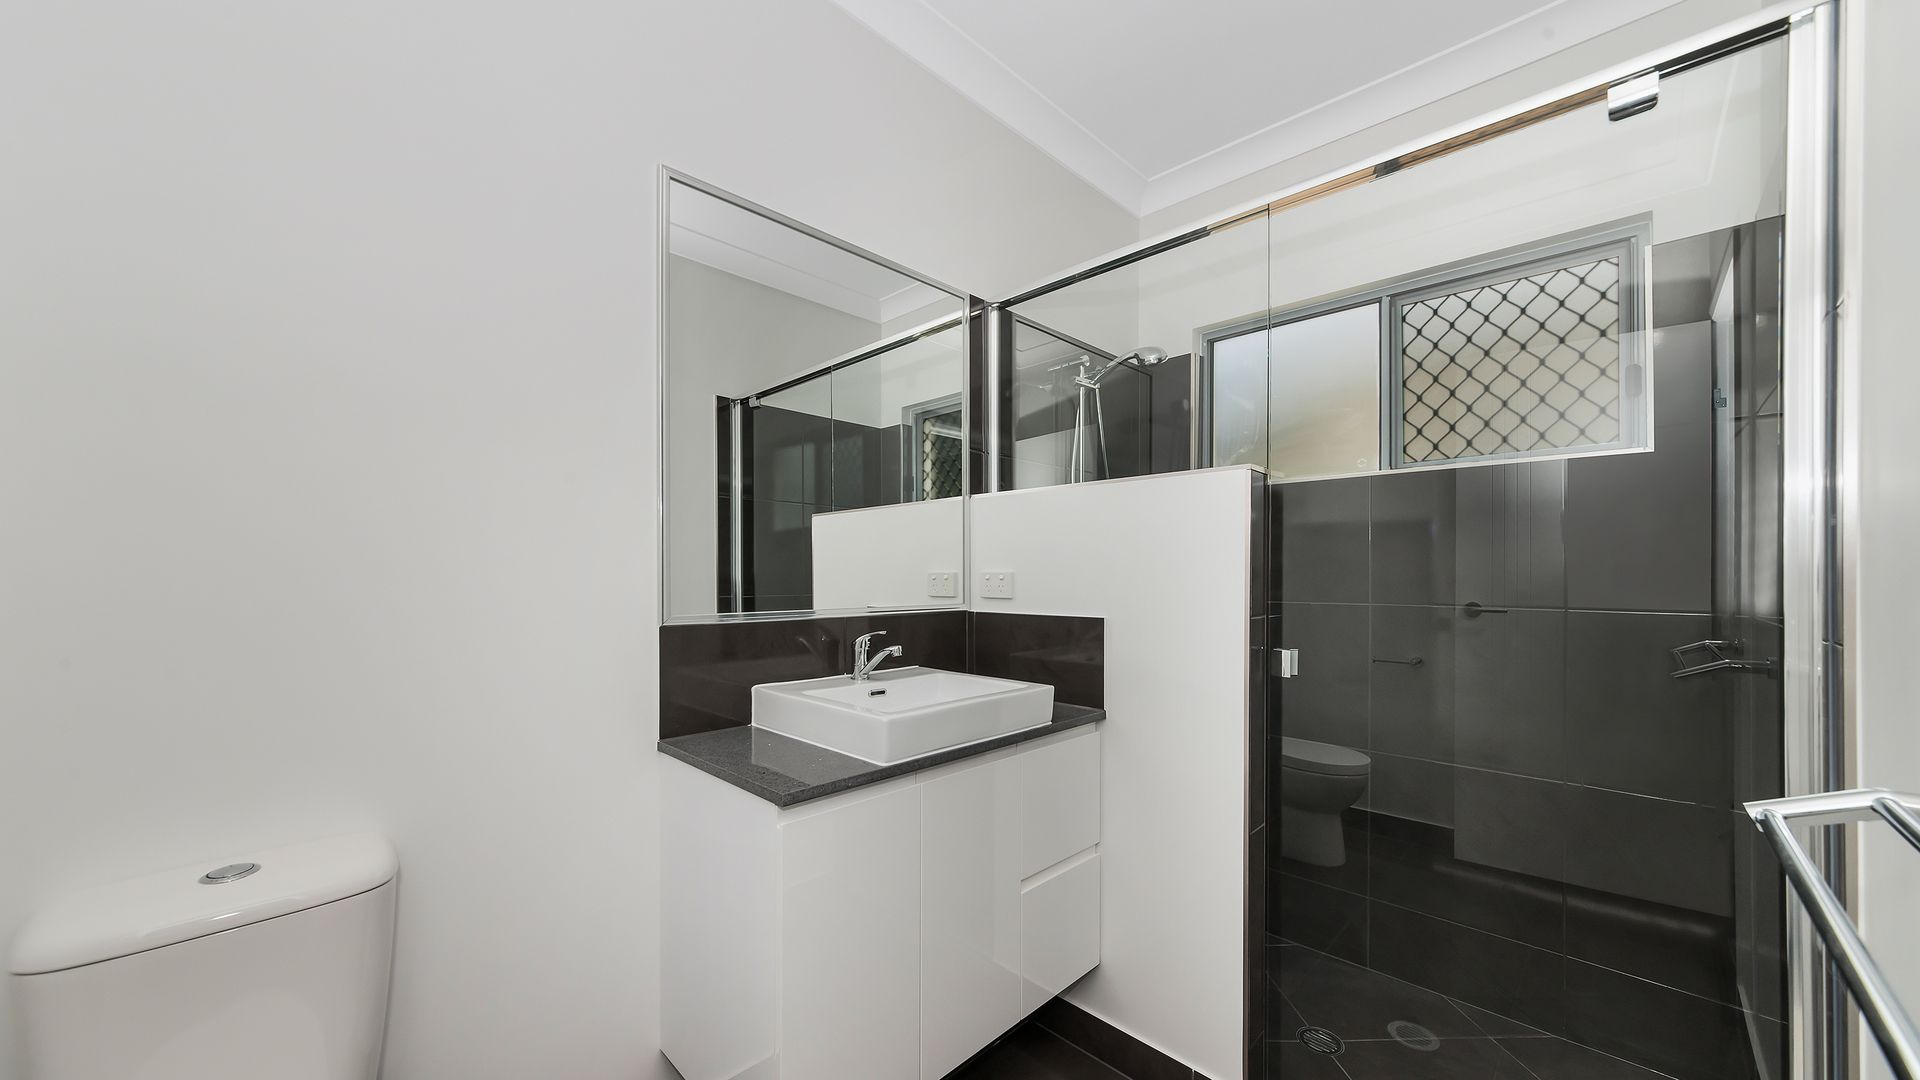 28 Kitchener Road, Pimlico QLD 4812 - Apartment For Sale | Domain